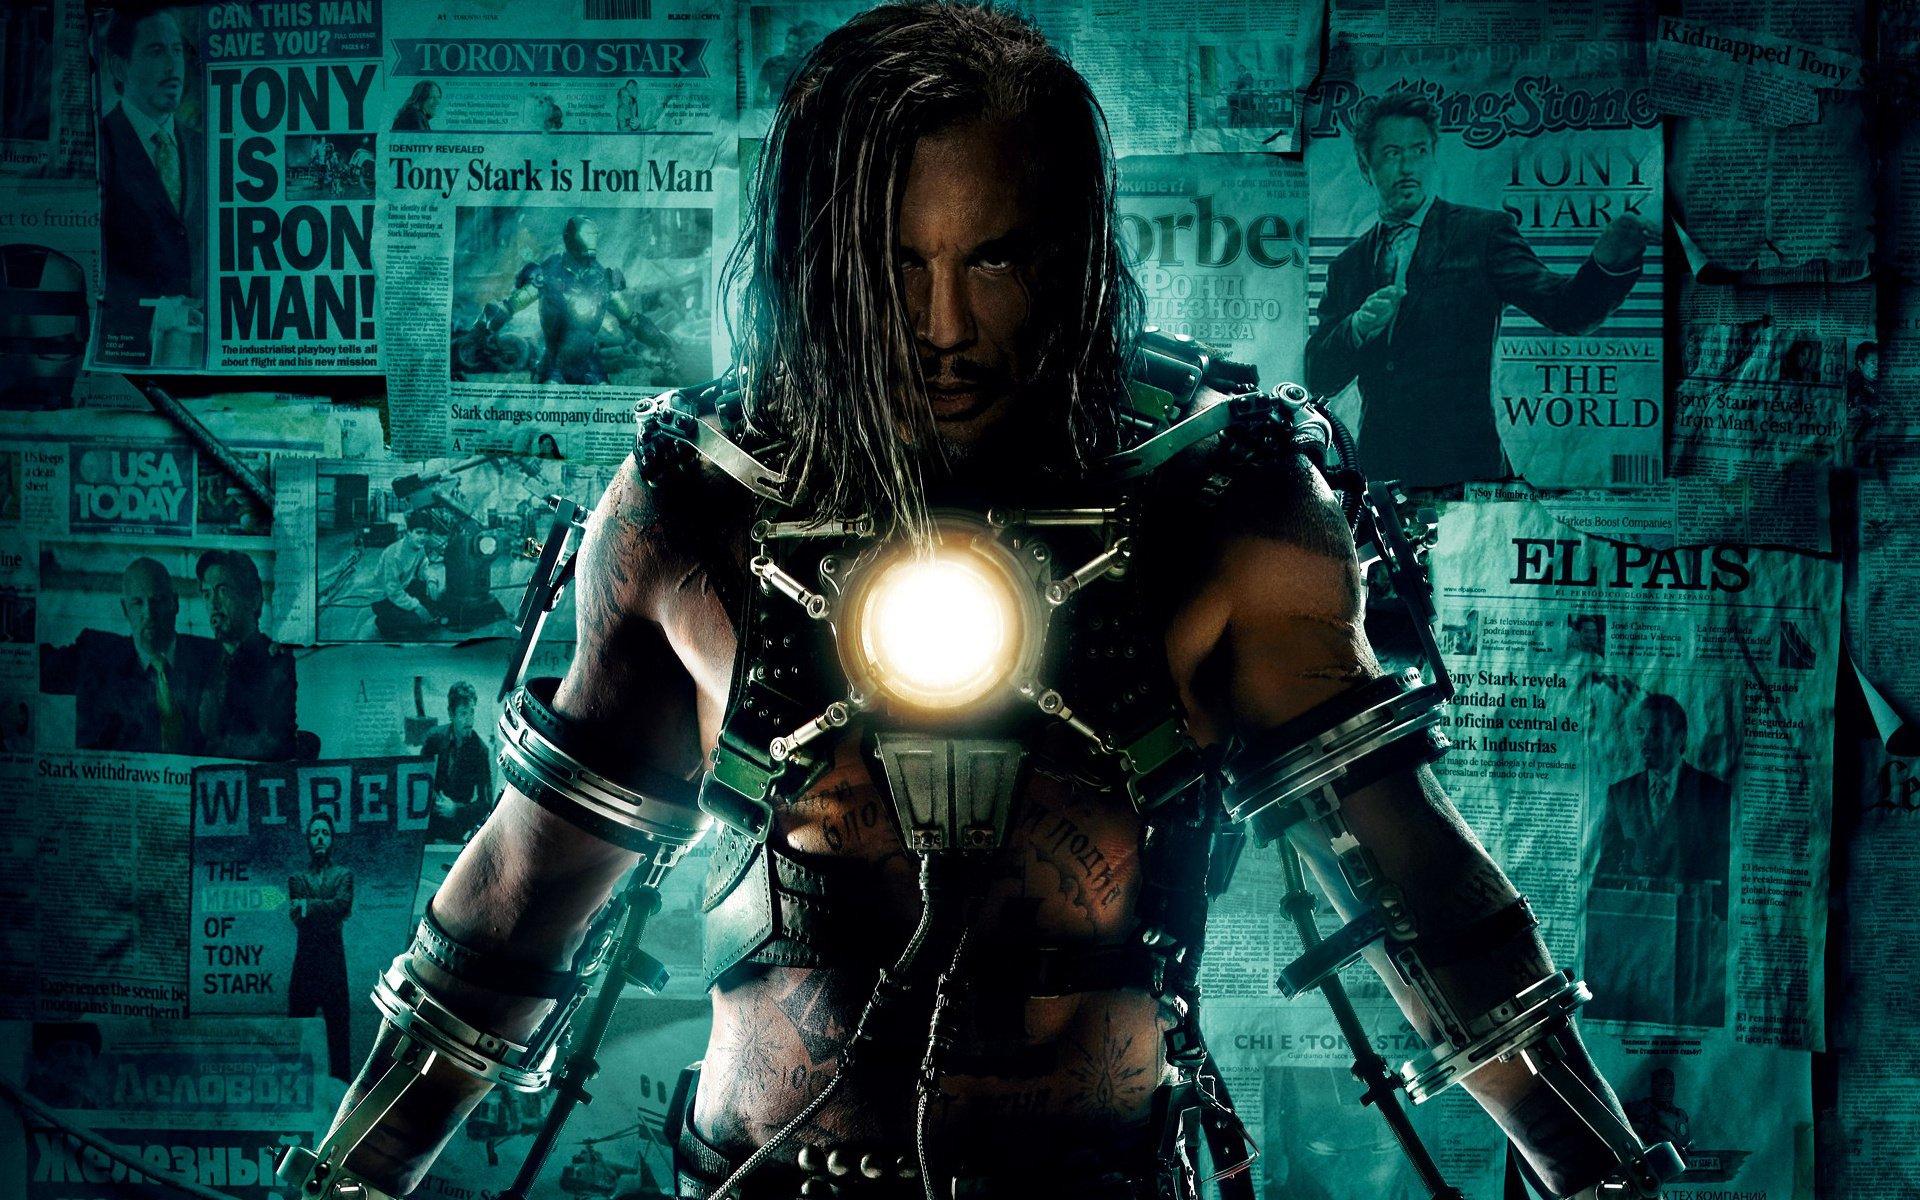 Iron Man 2 Black Background Movies Wallpaper: Iron Man 2 Full HD Wallpaper And Background Image